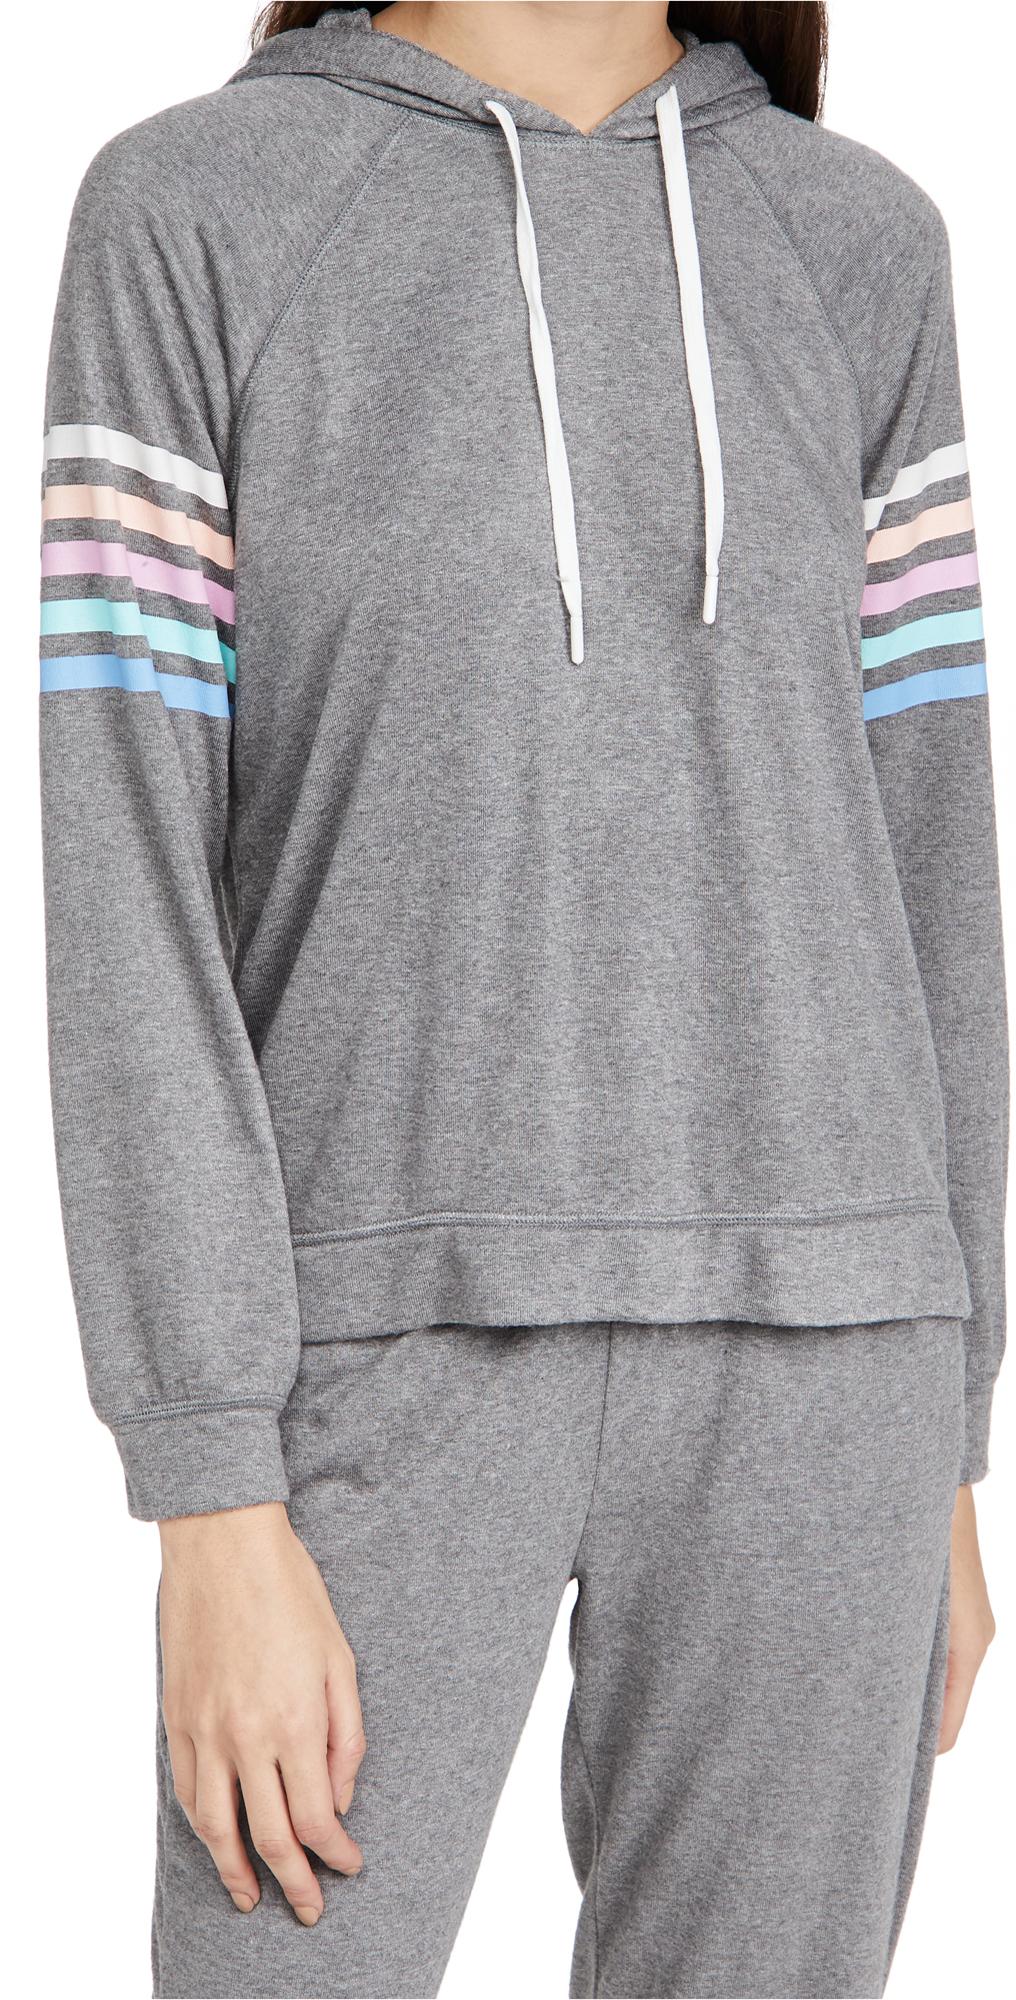 PJ Salvage Colorful Classic Sweatshirt